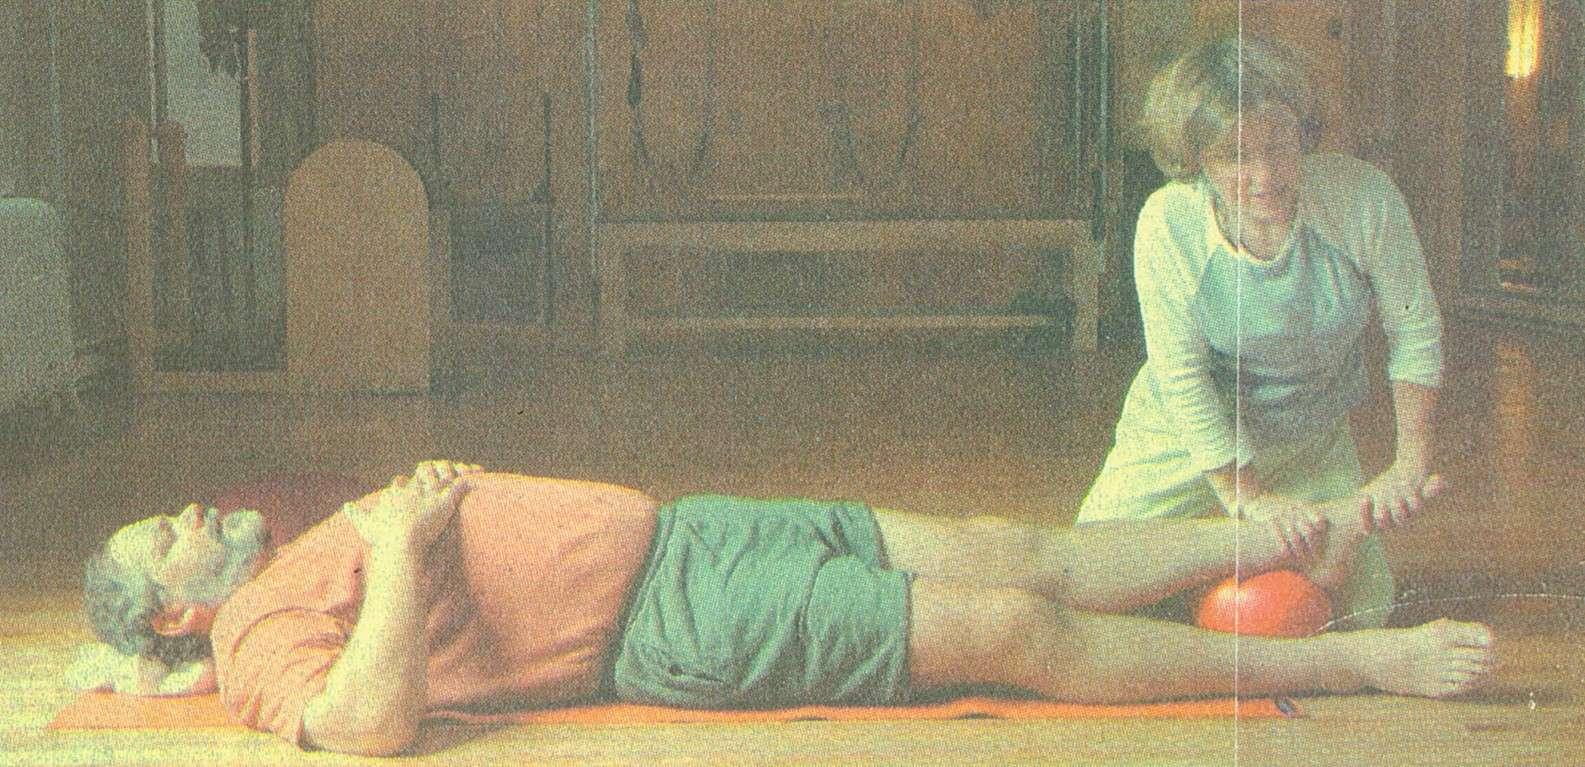 Philadelphia Inquirer – Balls That Massage Away Pain